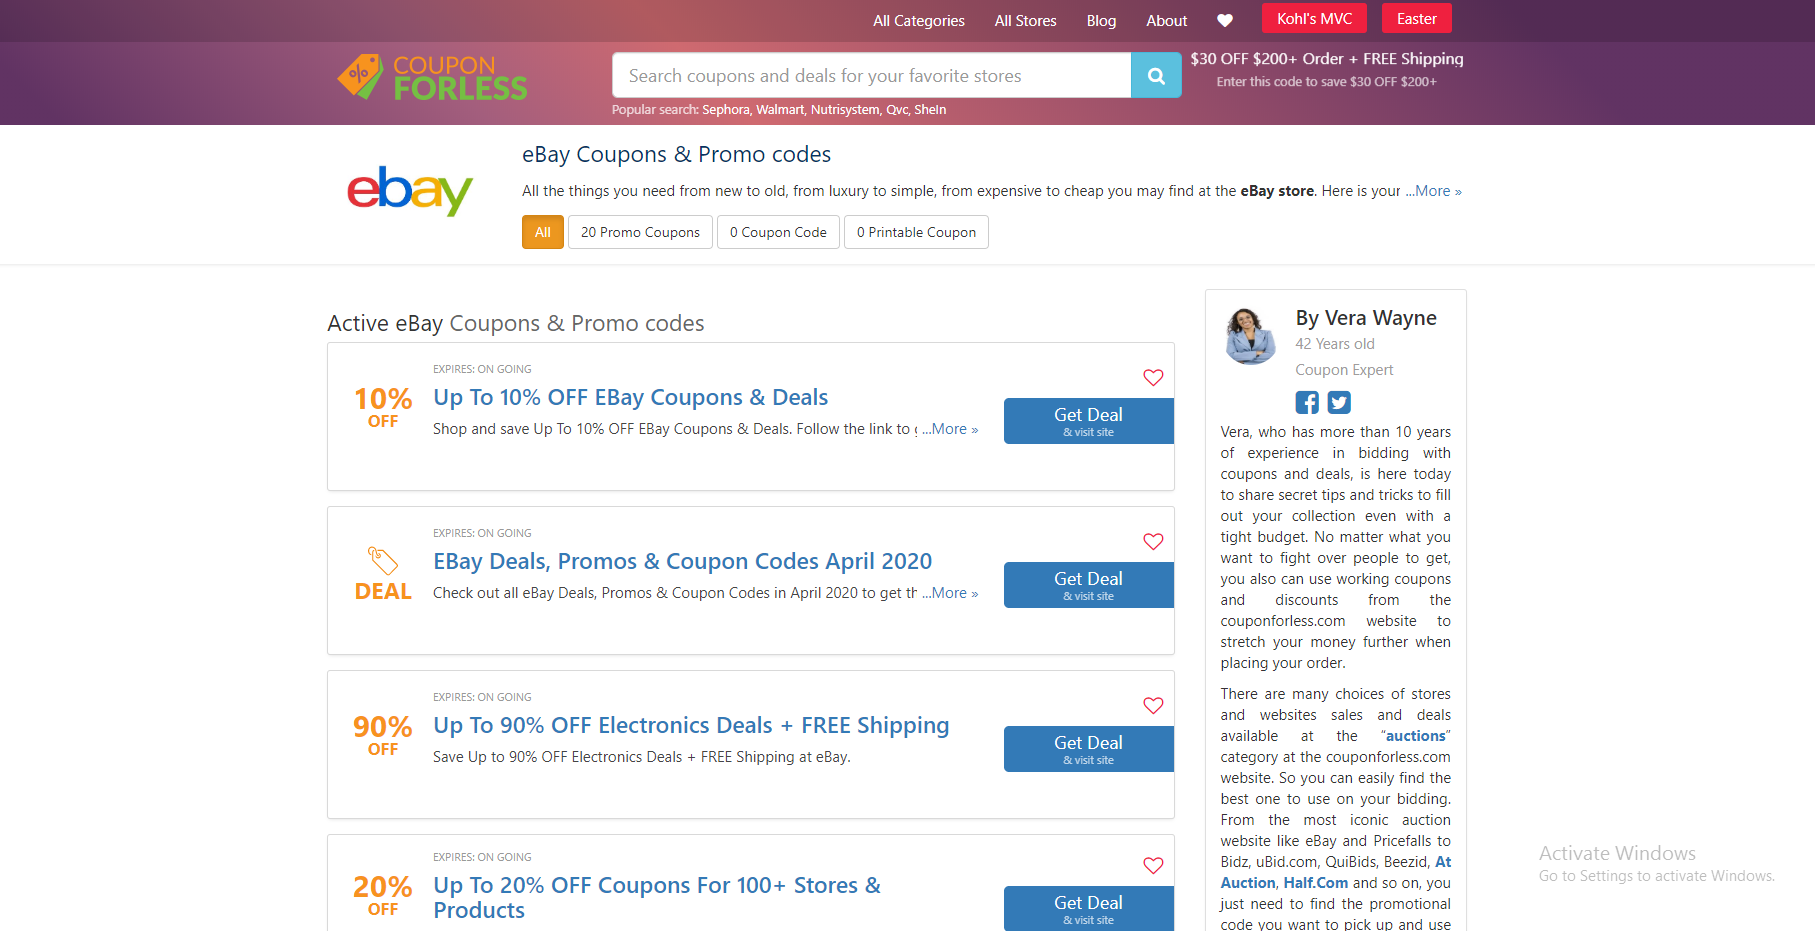 Ebay Free Shipping Code No Minimum 10 Percent Off Coupon In 2020 Promo Codes Ebay Coupon Code Free Shipping Coupon Codes